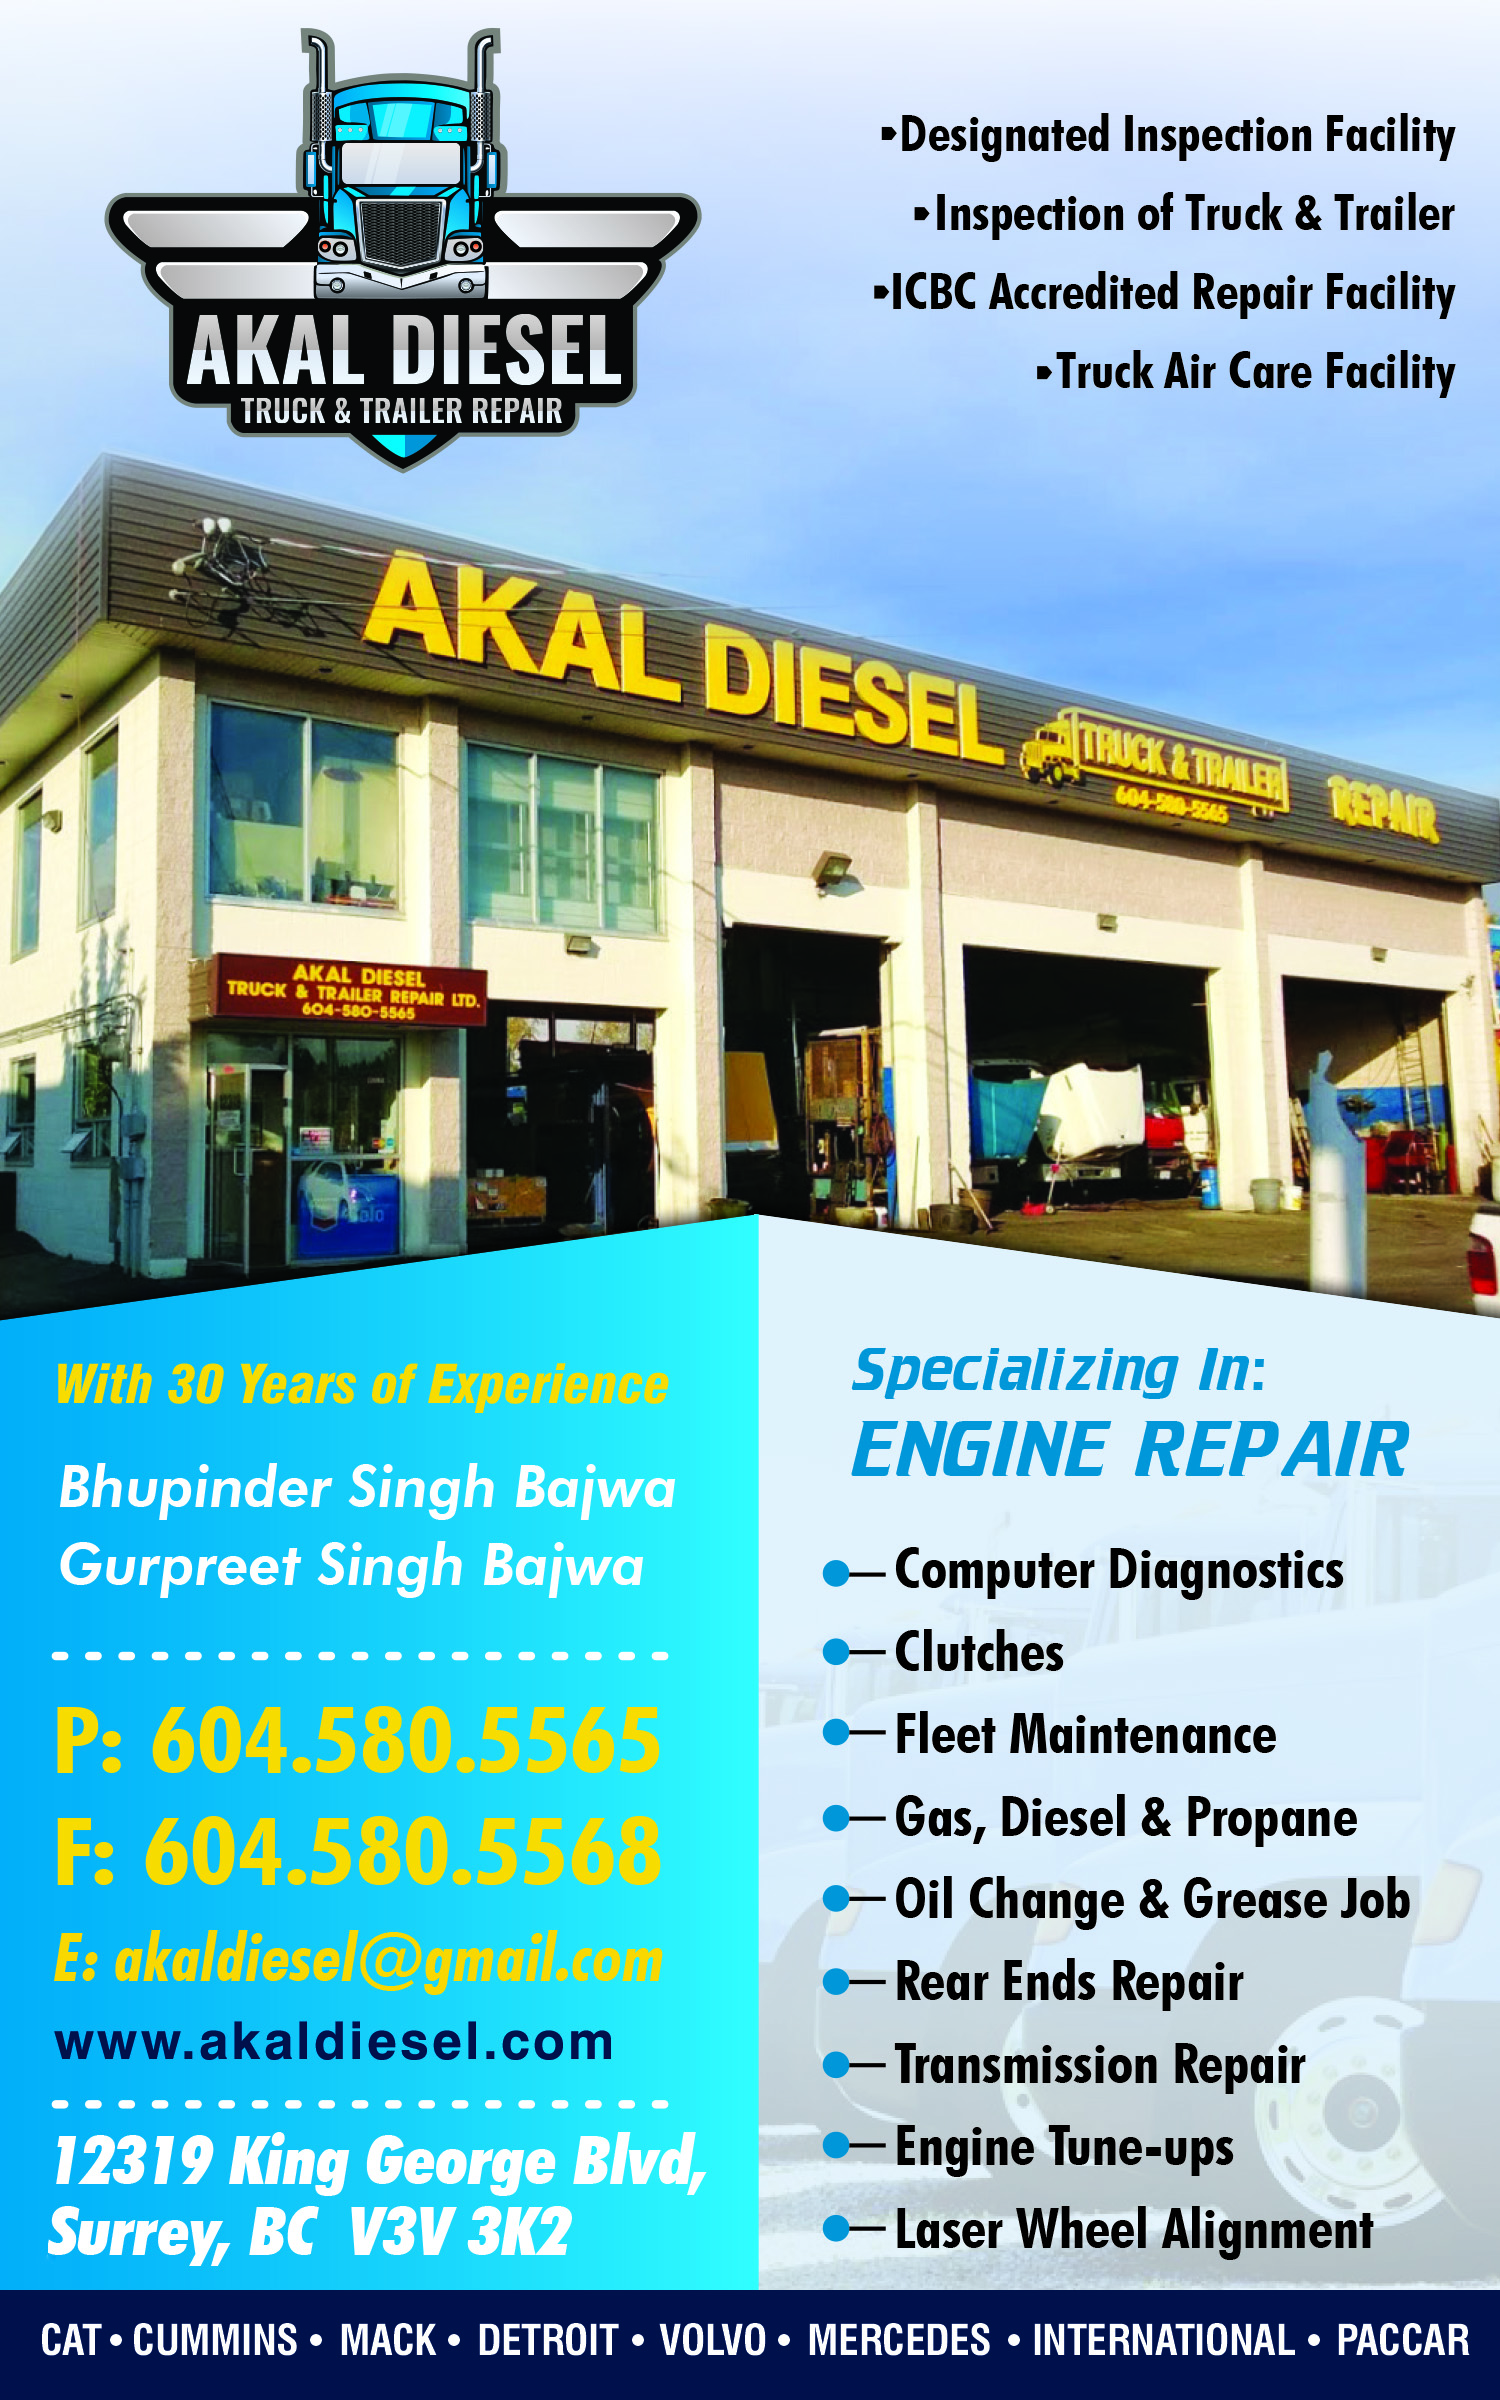 akal-diesel-truck-trailer-repair-66Bgyub.jpeg